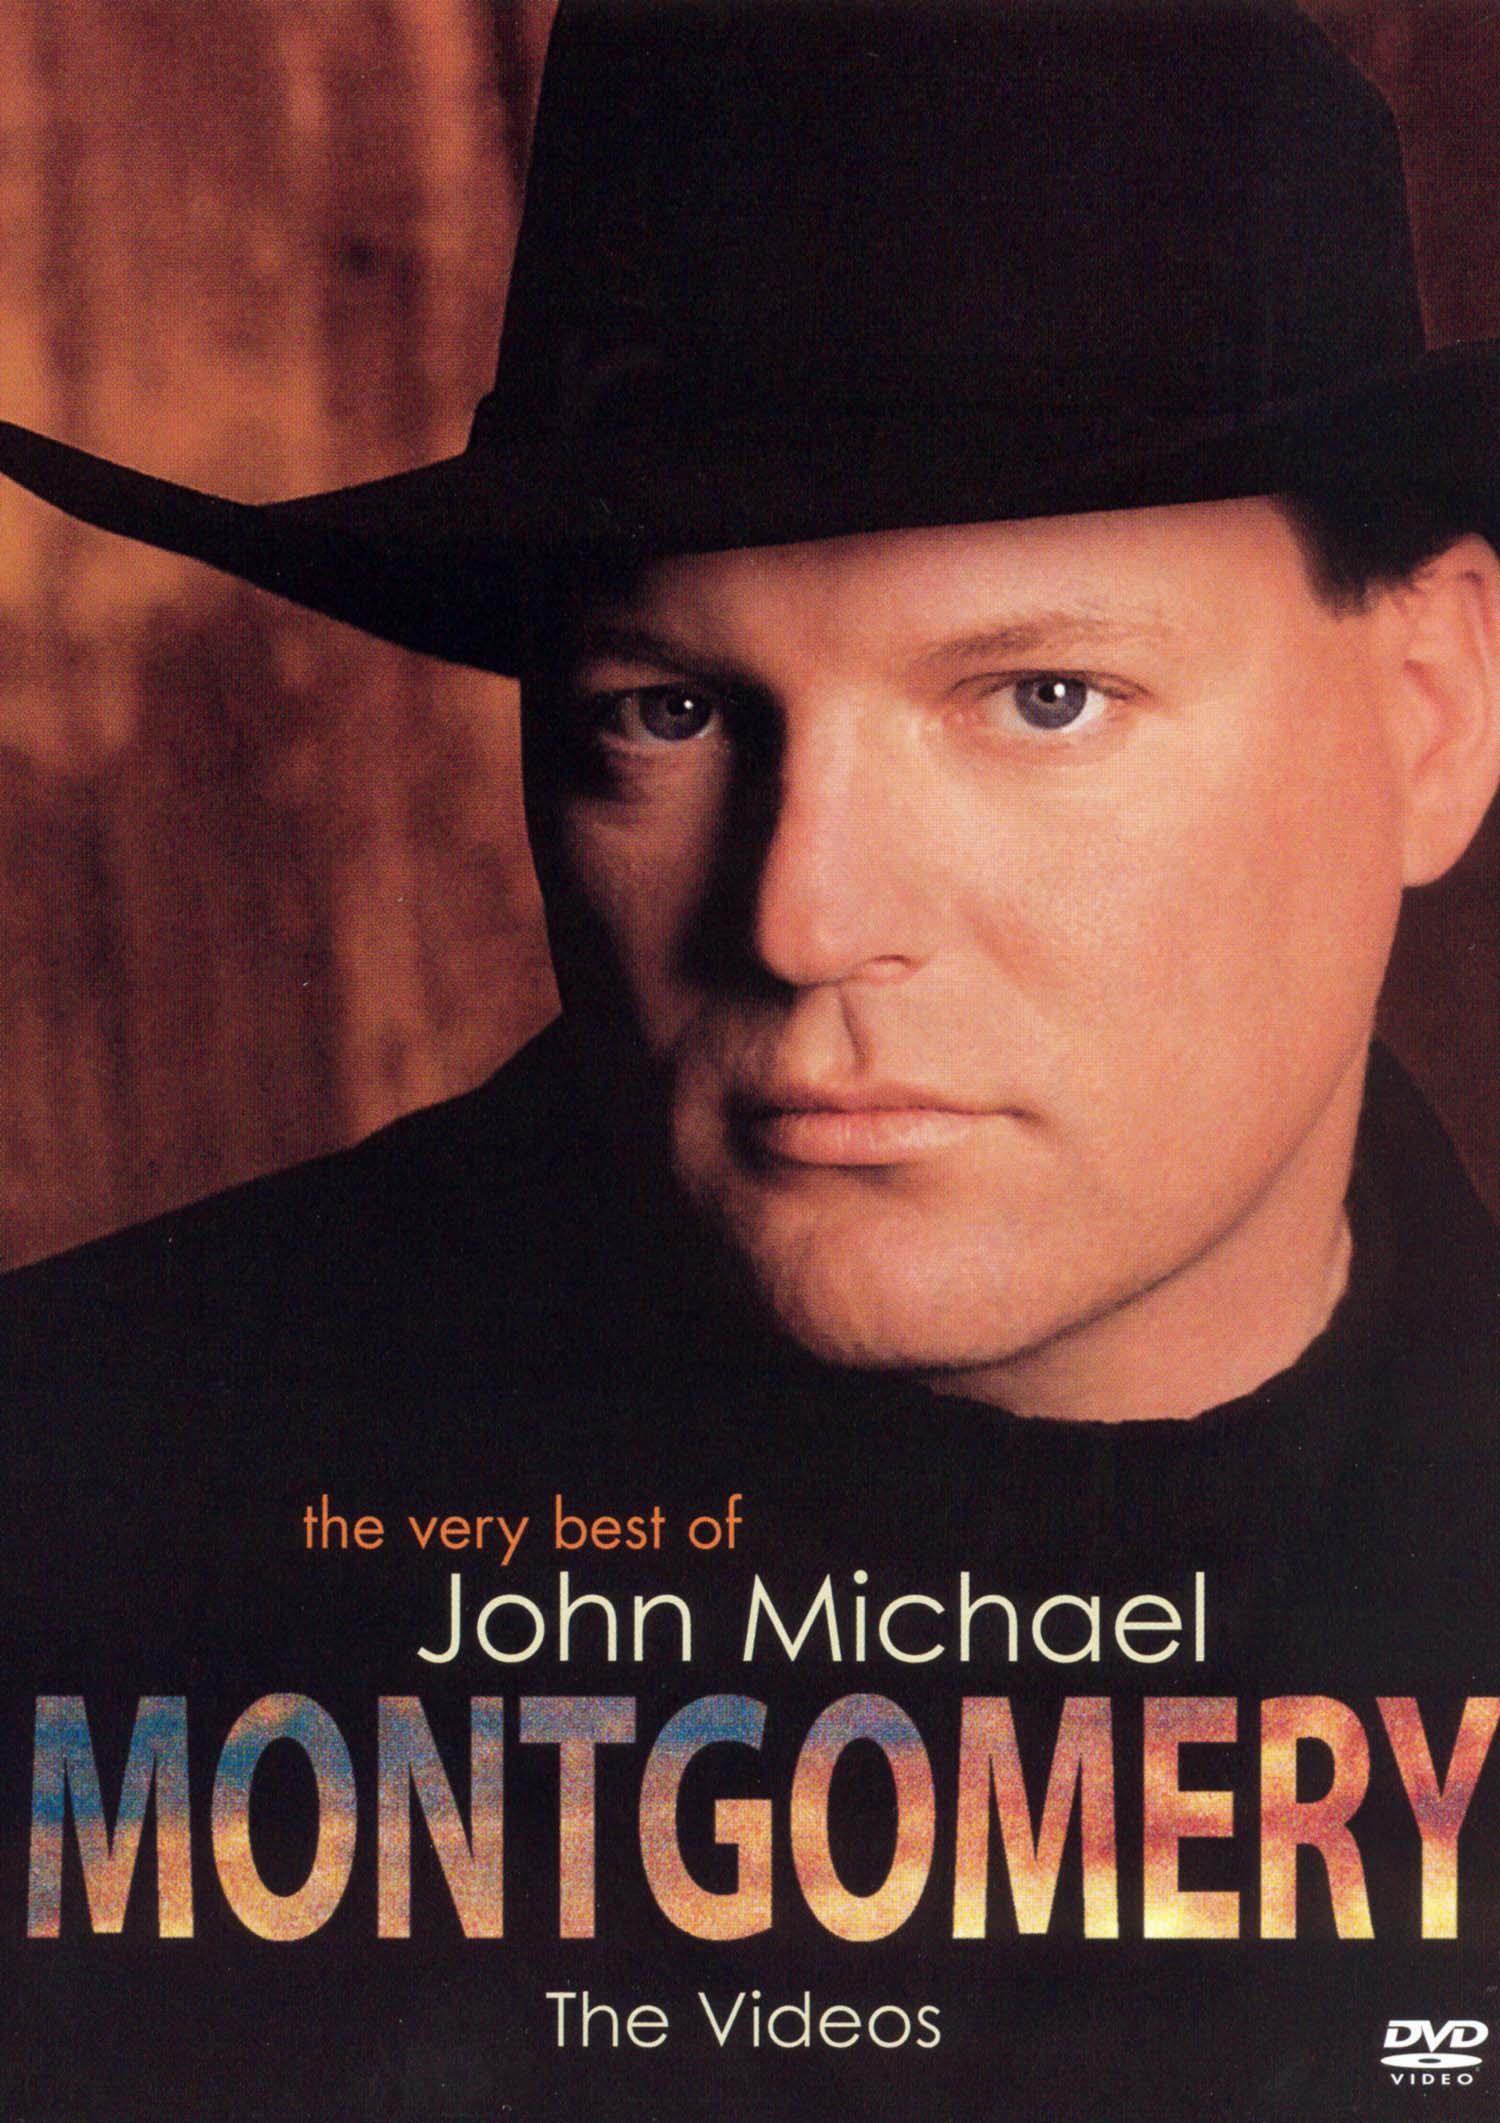 John Michael Montgomery: The Very Best of John Michael Montgomery - The Videos